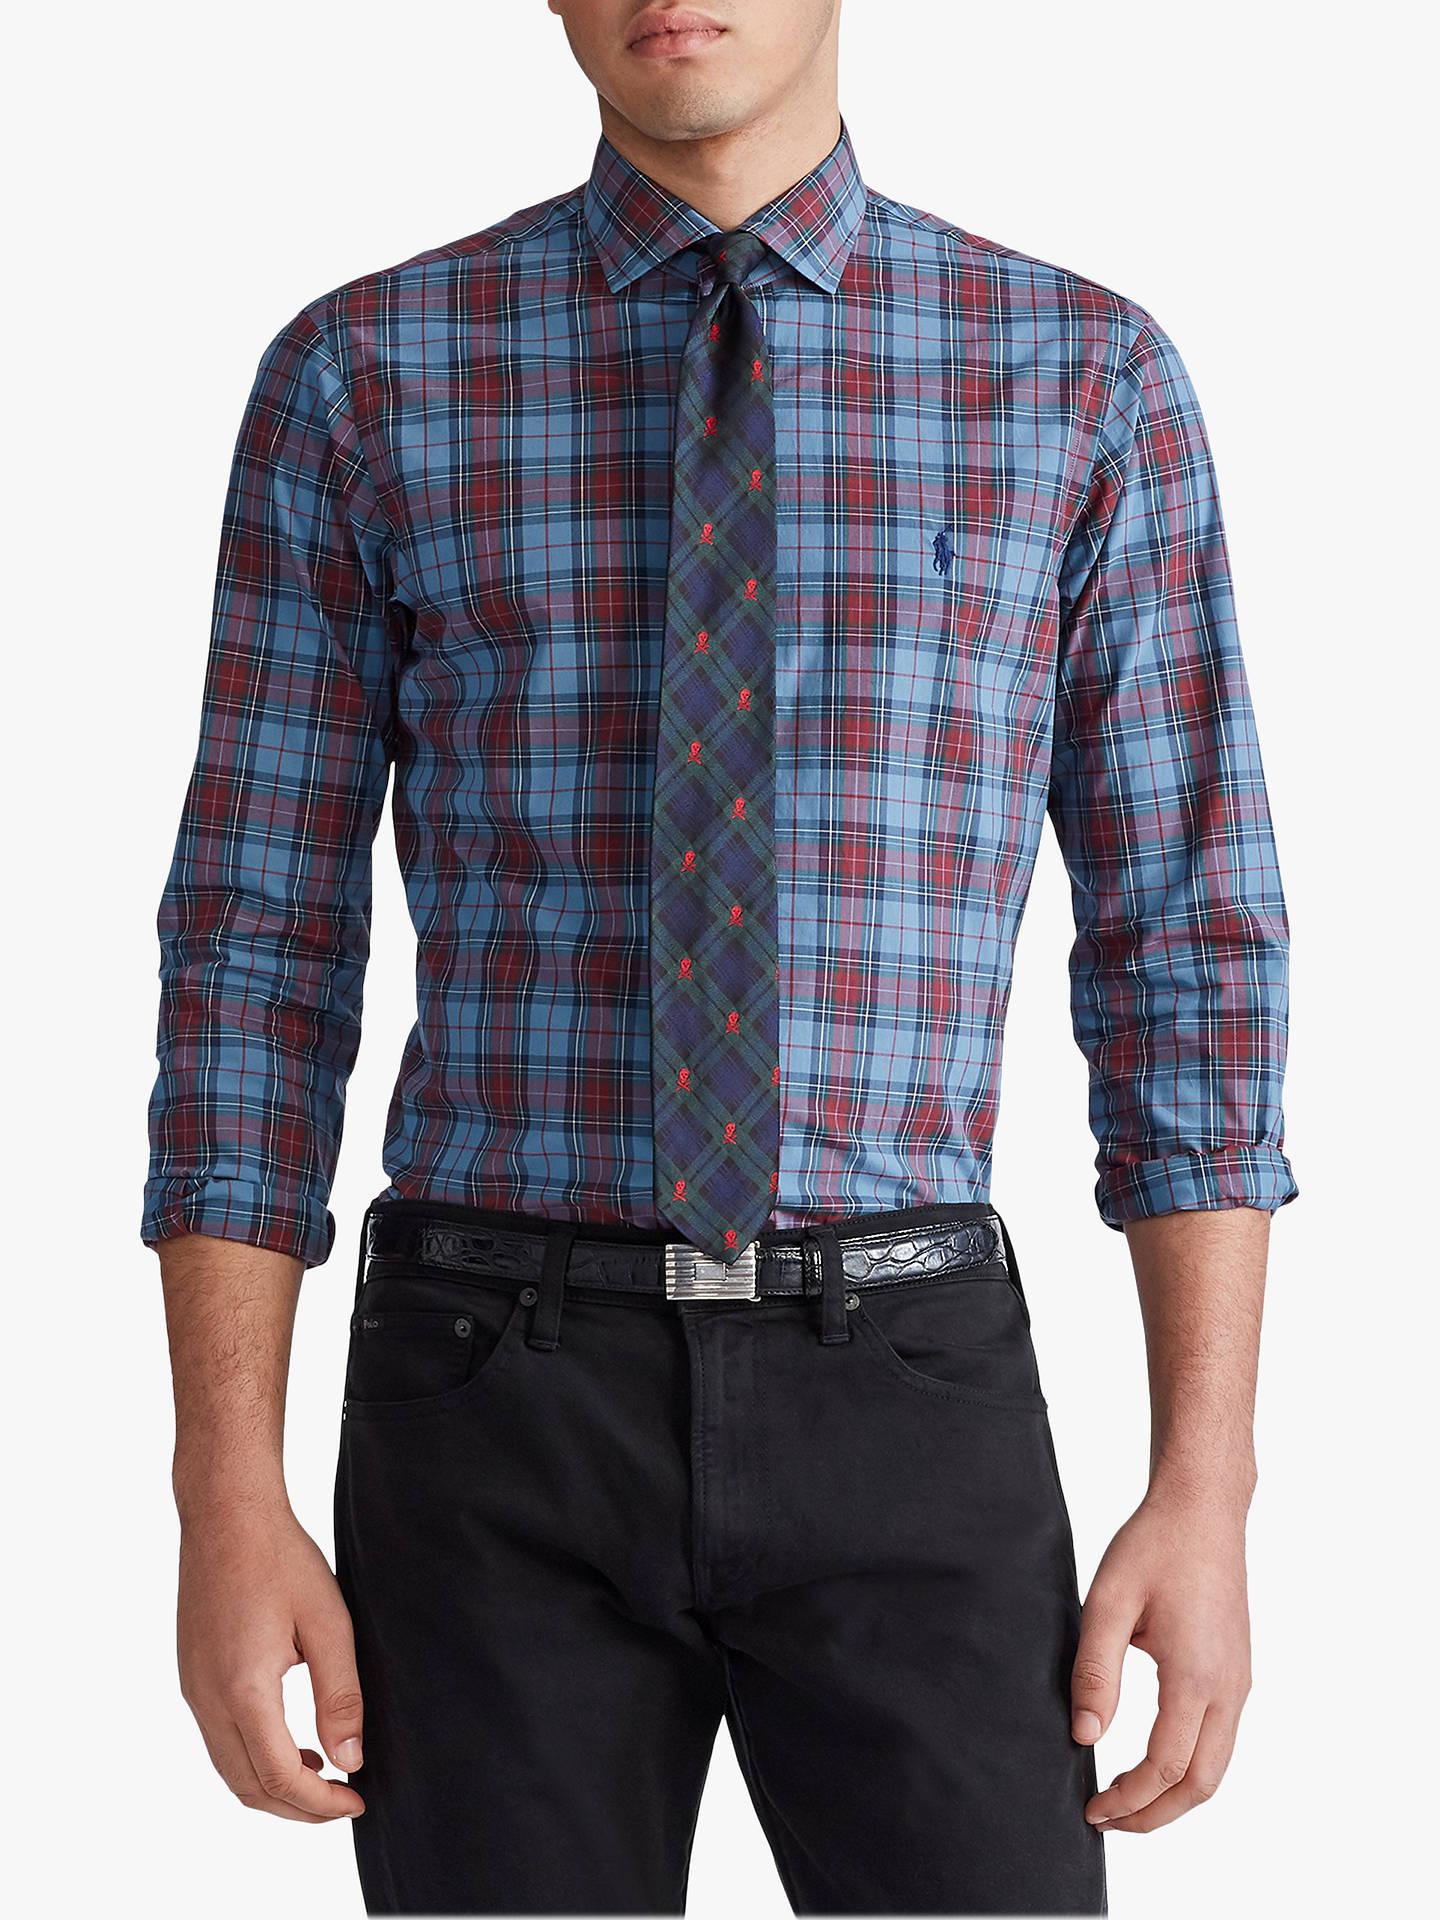 Polo Ralph Lauren Check Sports Shirt, Steel Blue/Wine Multi by Ralph Lauren